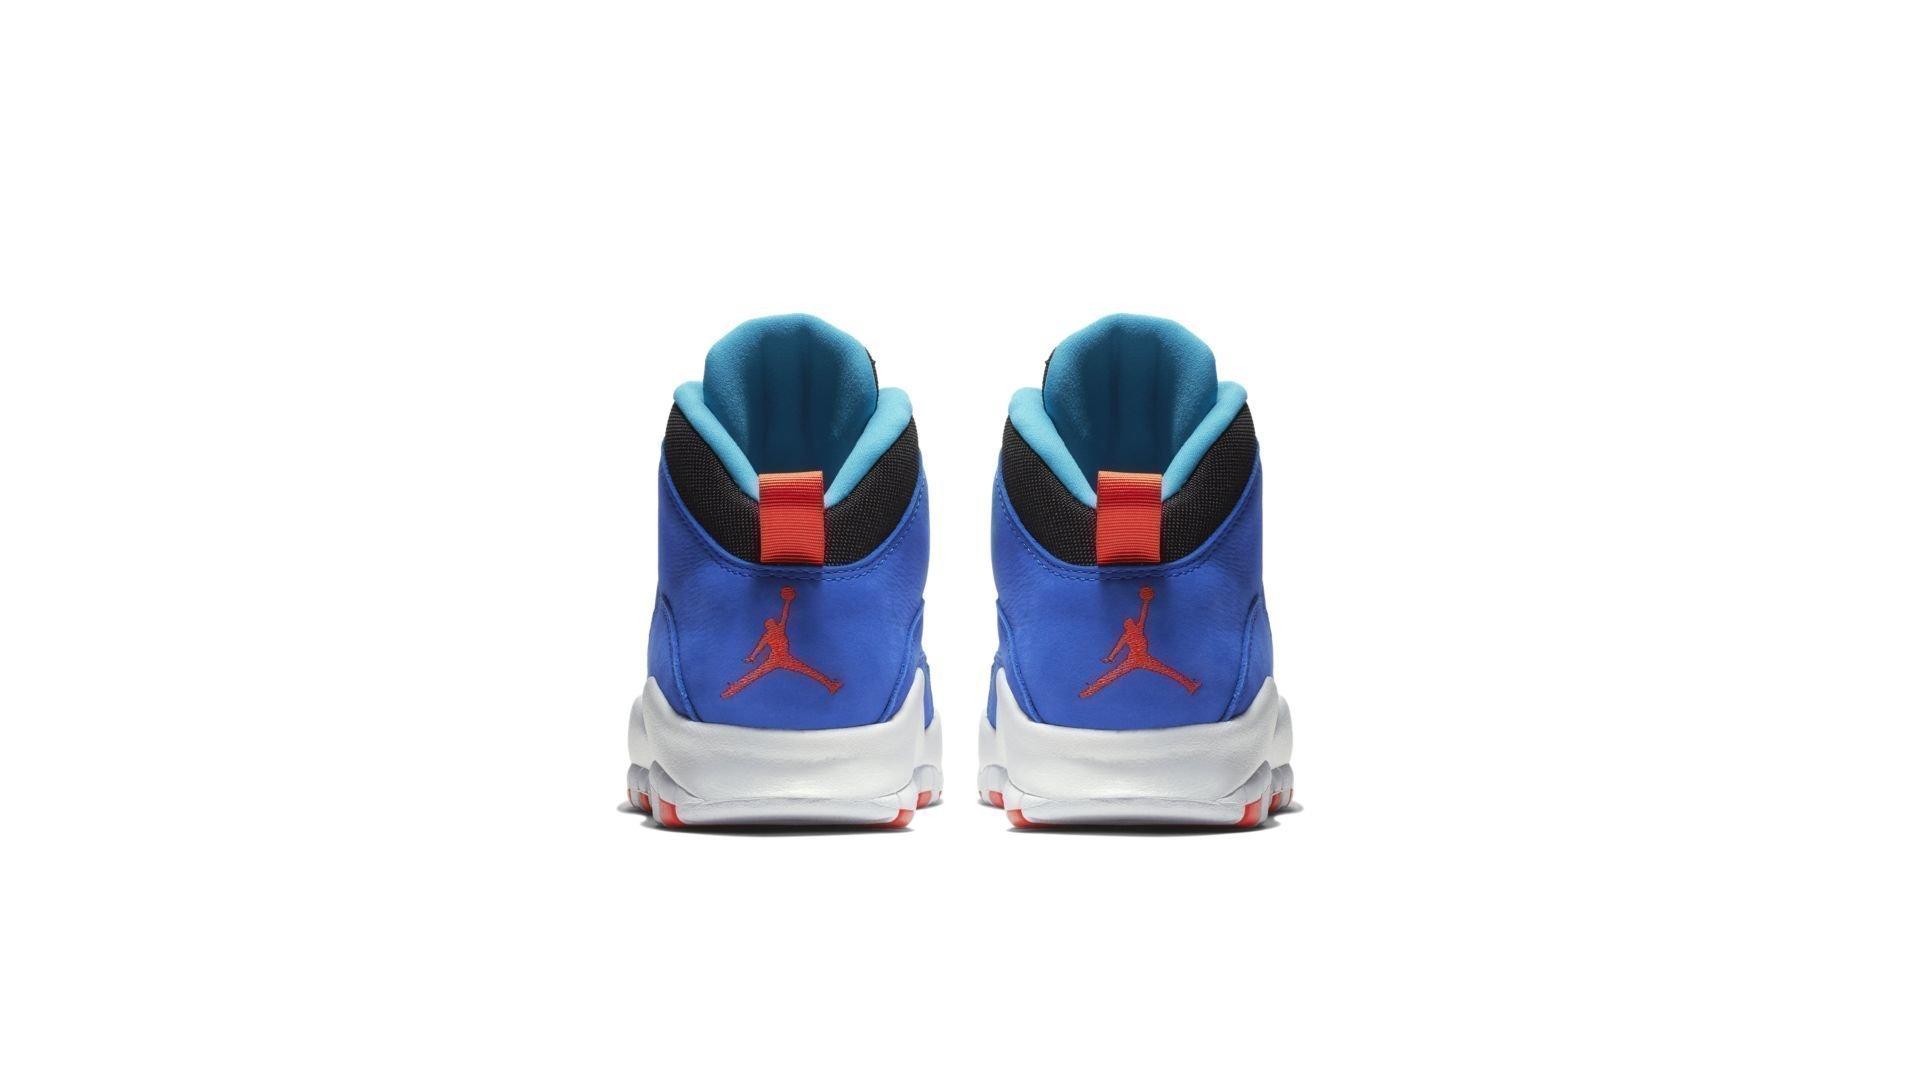 Jordan 10 Retro Tinker (310805-408)